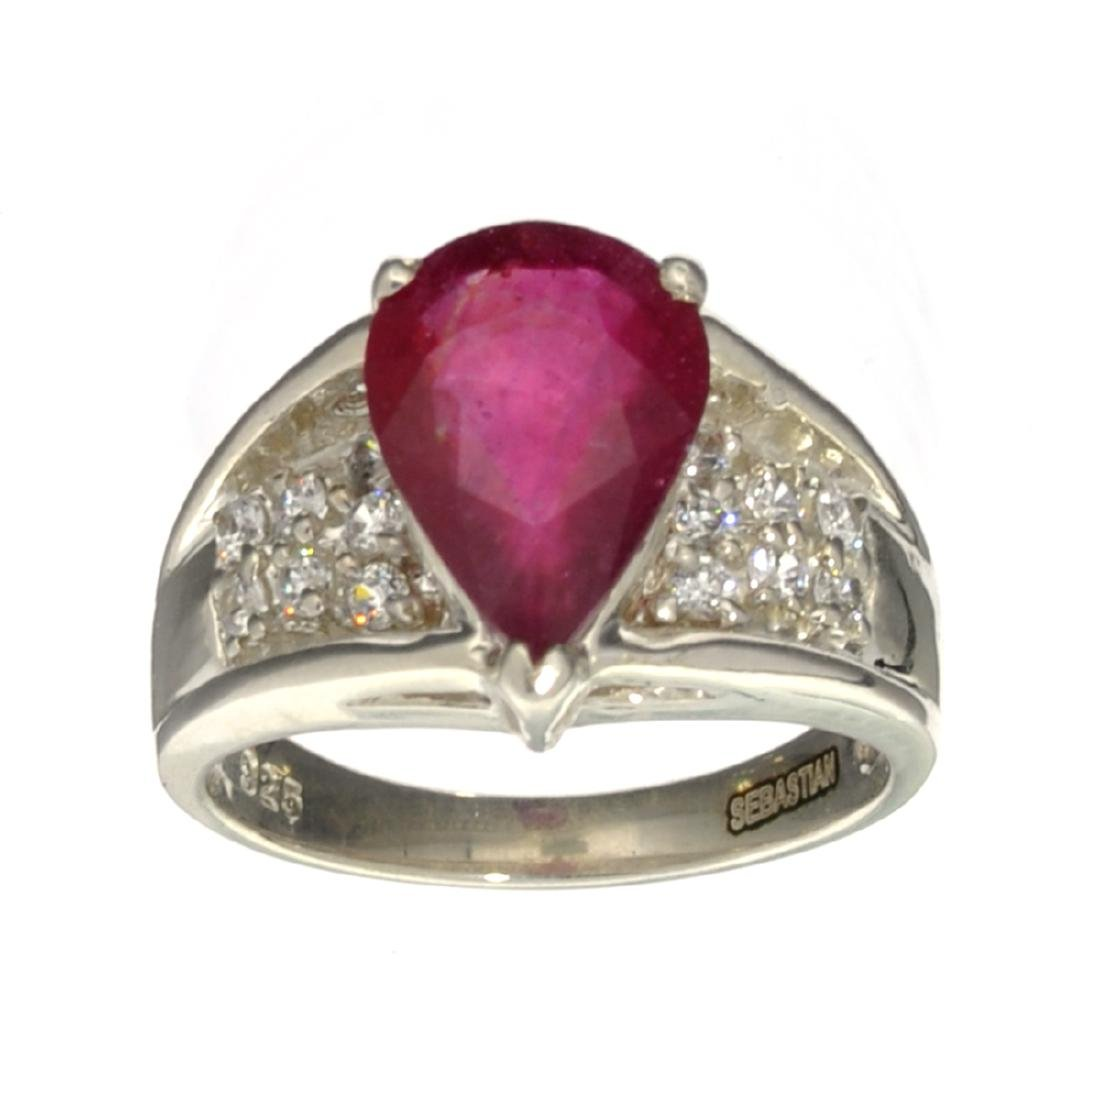 APP: 1k Fine Jewelry Designer Sebastian, 3.68CT Ruby